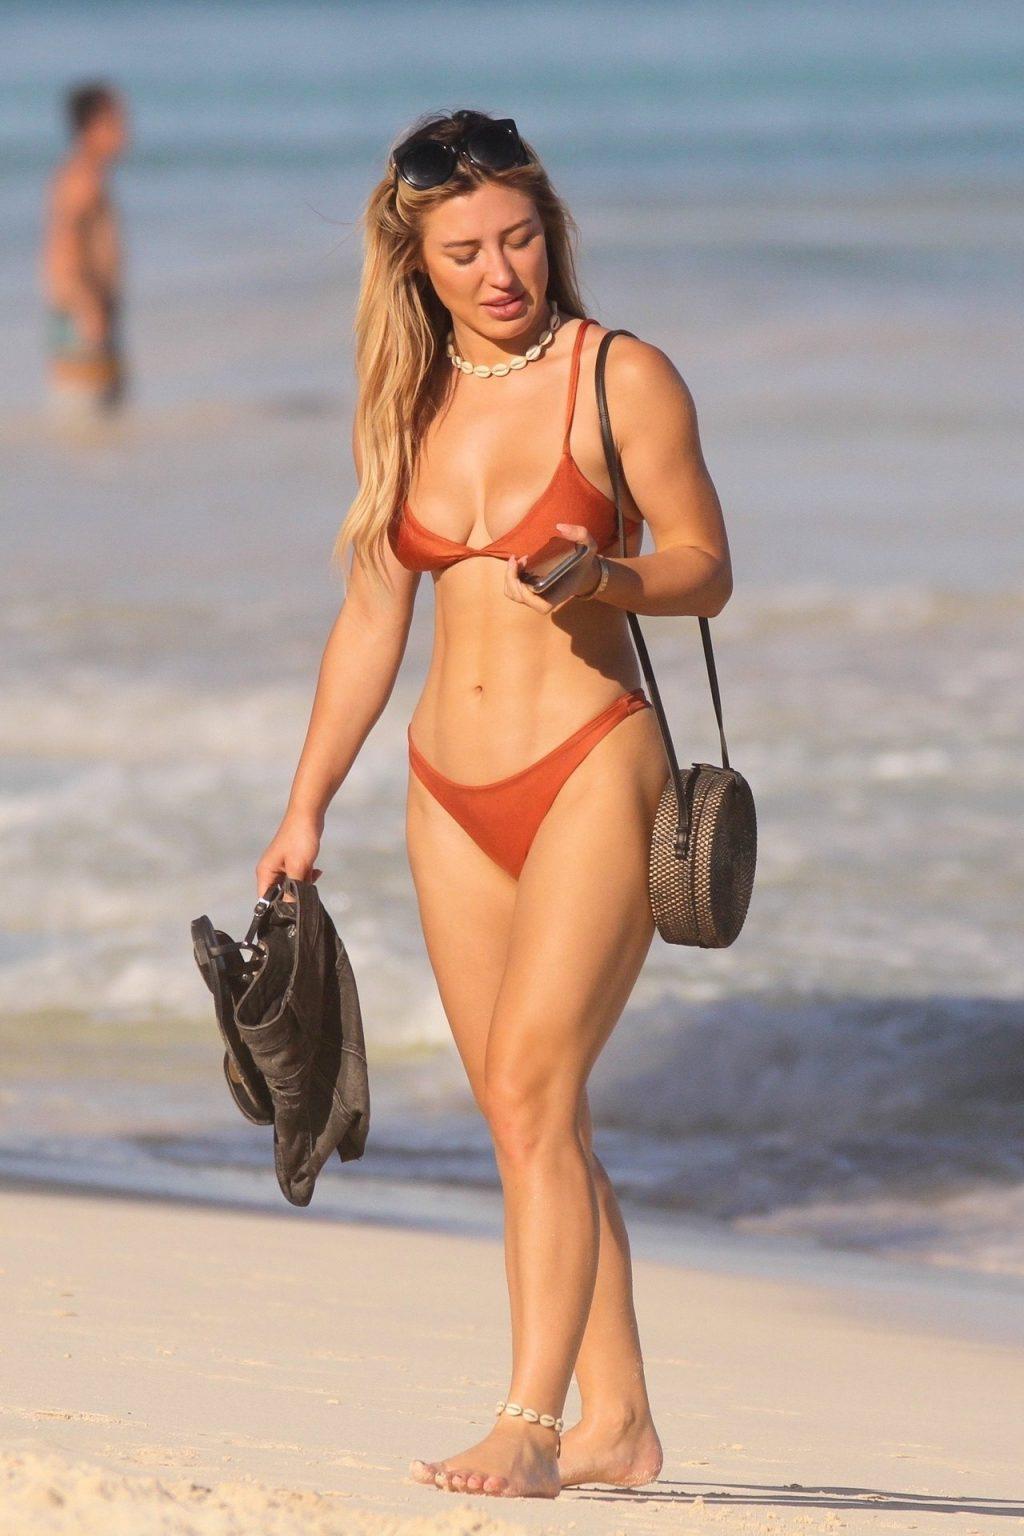 Stefanie Knight Sexy (42 Photos)